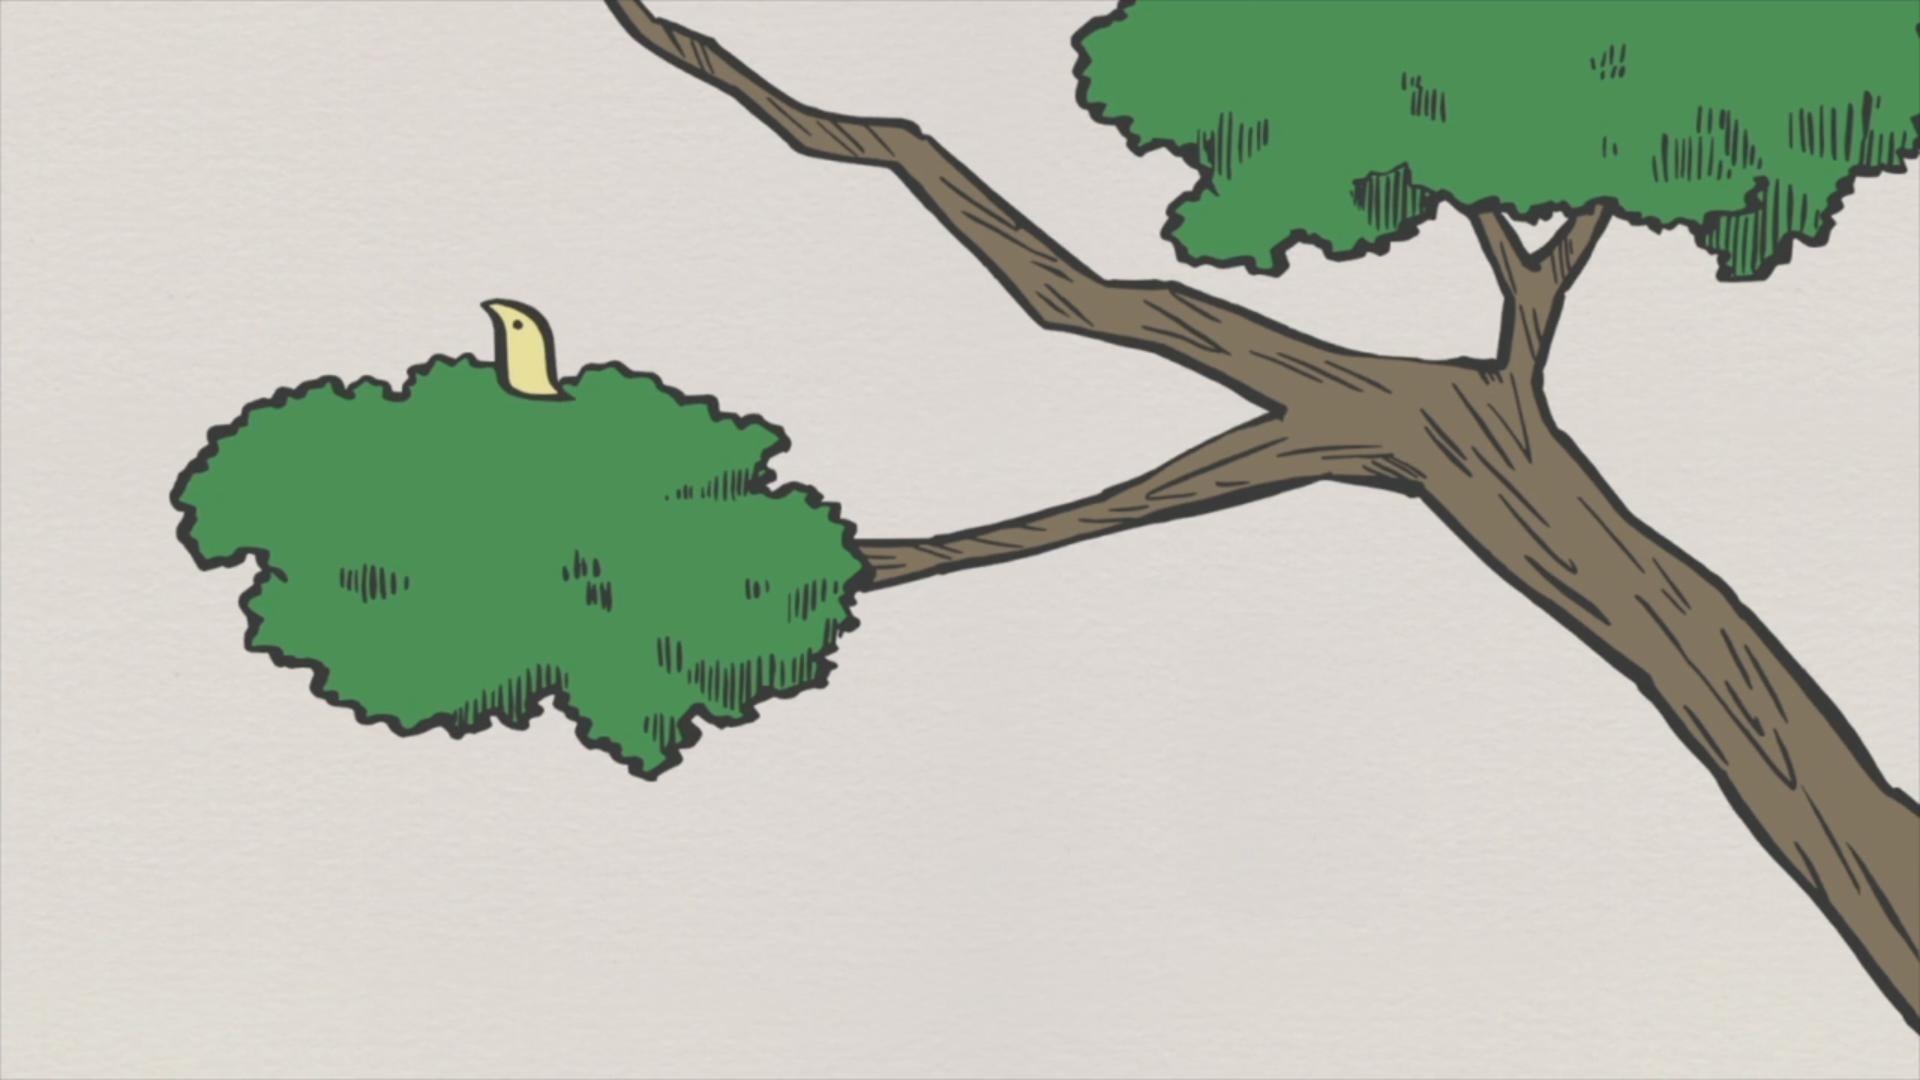 Arbol Con Ramas Animado: วอลเปเปอร์ : ต้นไม้